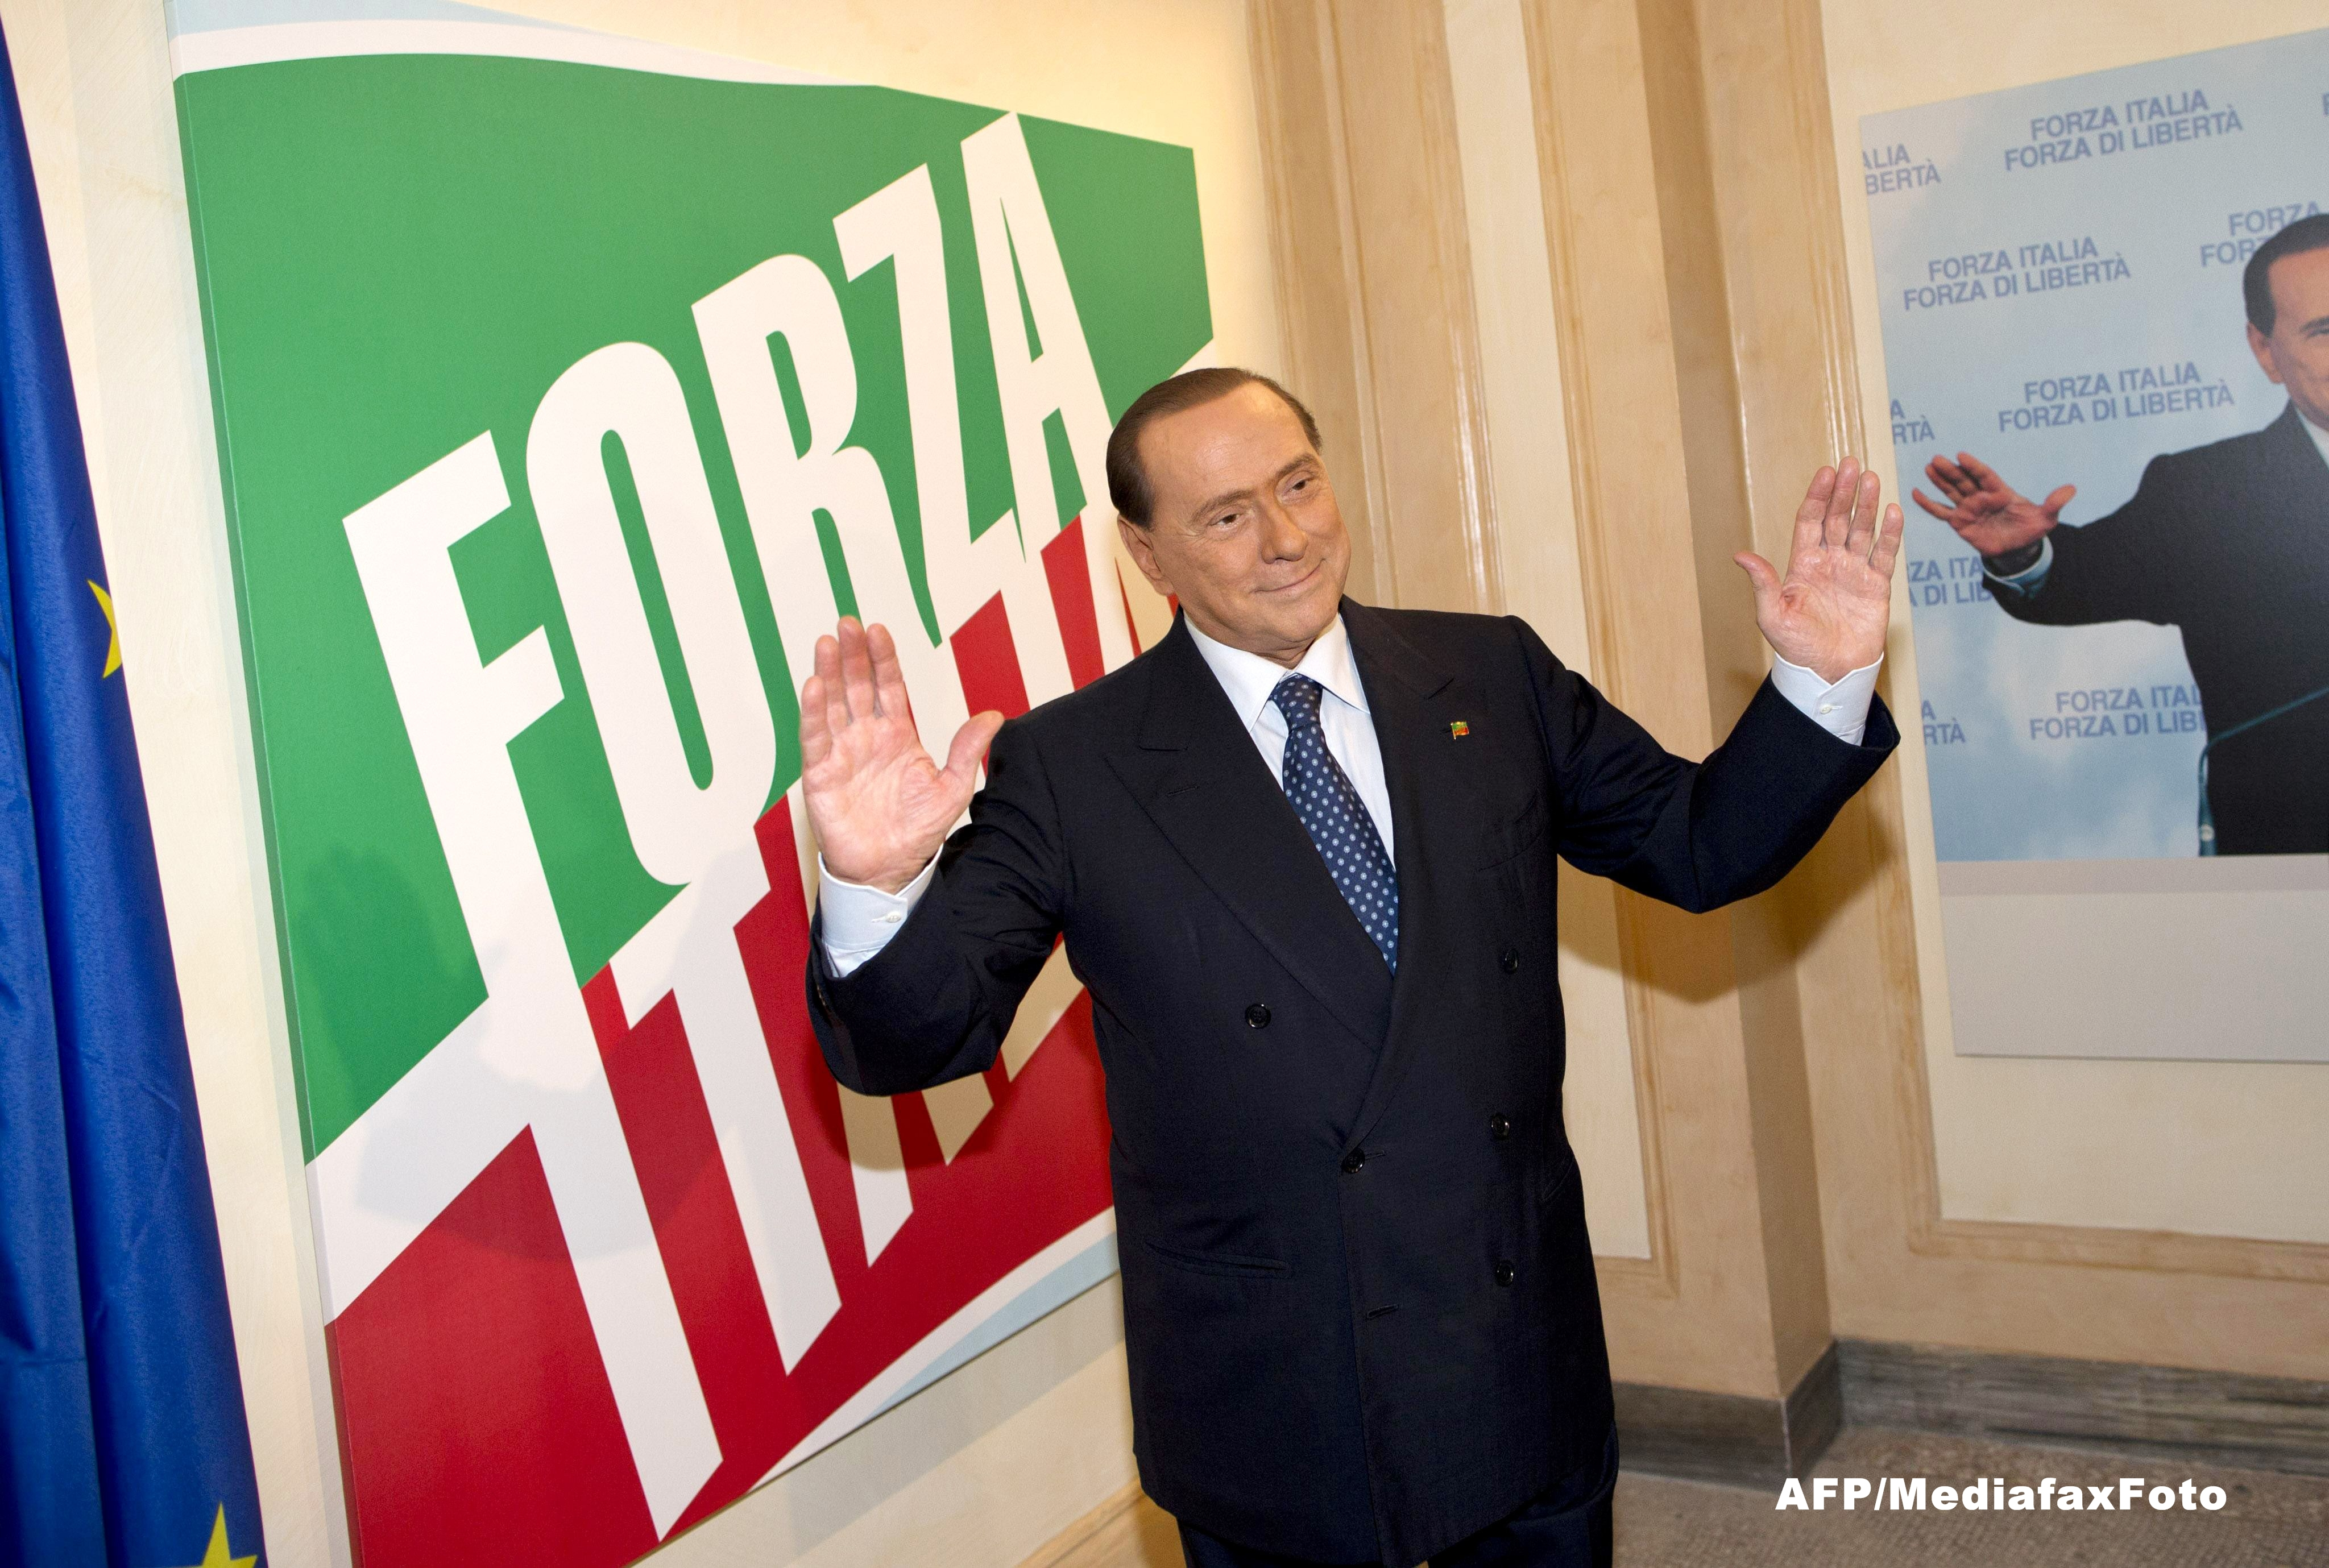 Silvio Berlusconi spune ca a primit propuneri din Romania pentru a candida la europarlamentare